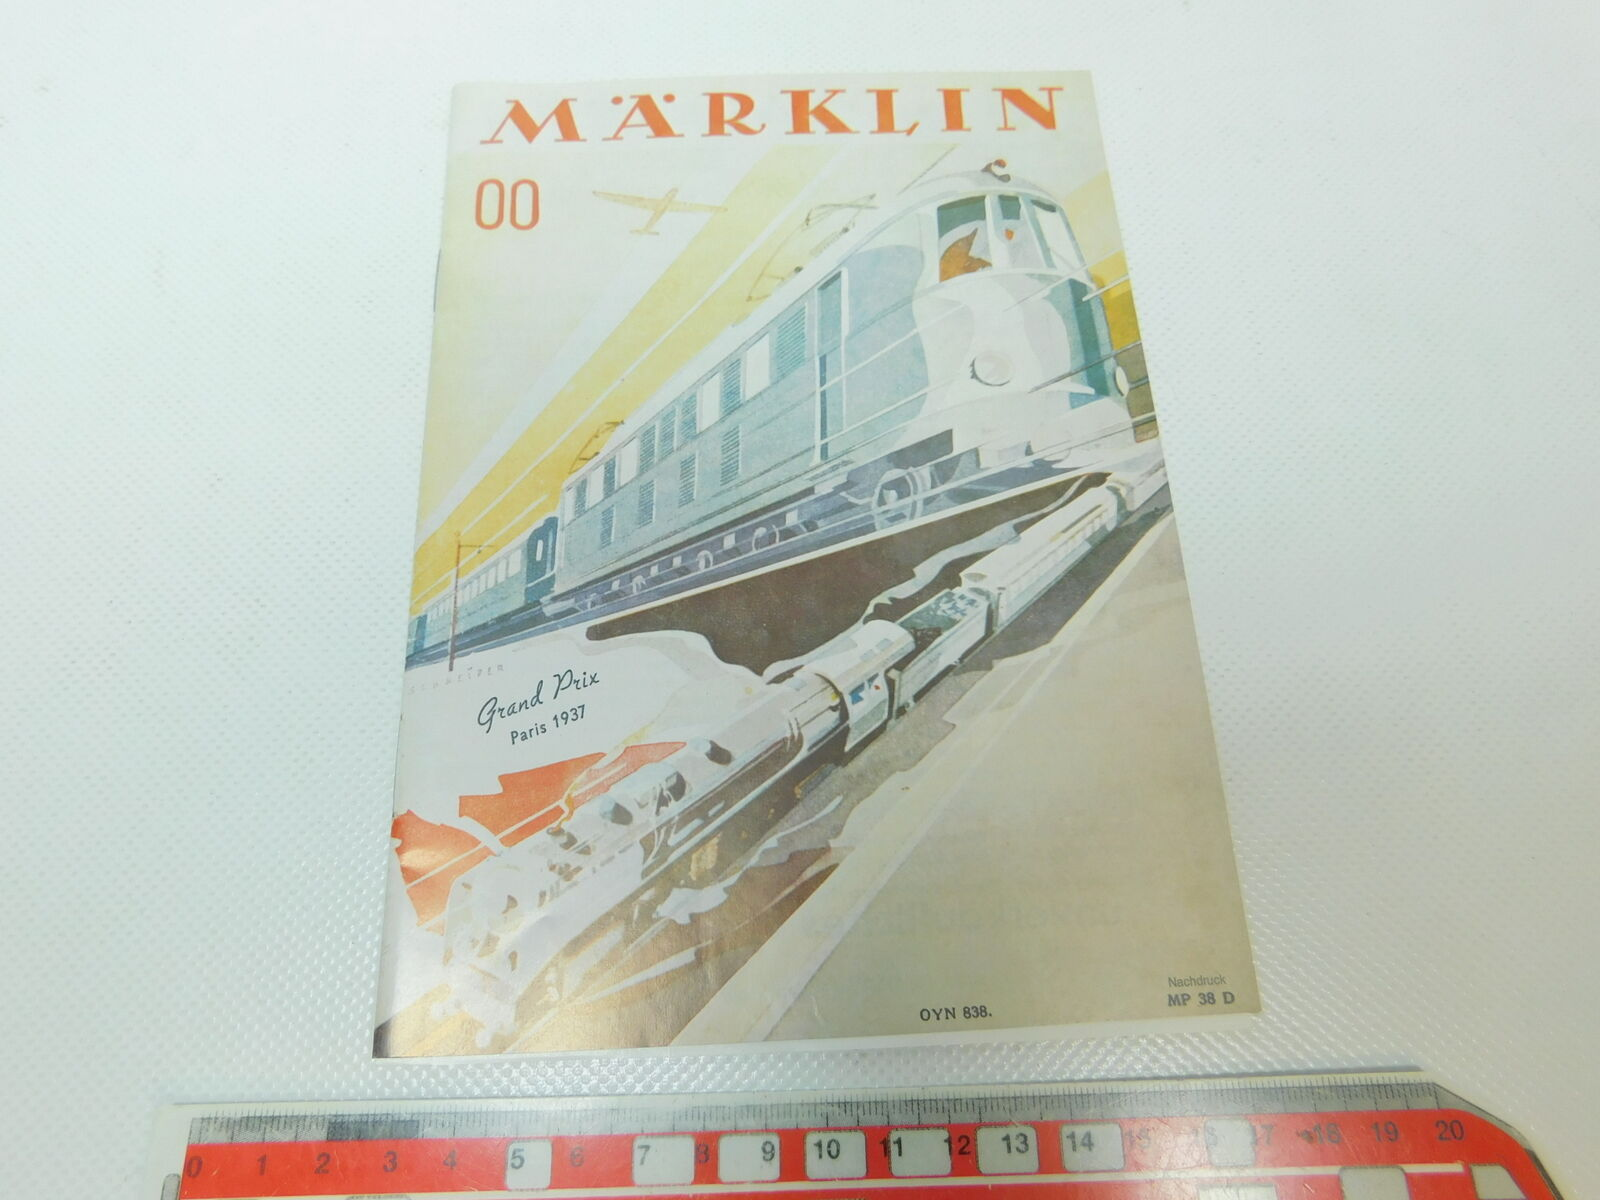 BP439-0,5 Märklin Gauge 00 Reproduction Catalogue Mp 38 1938 D Electric